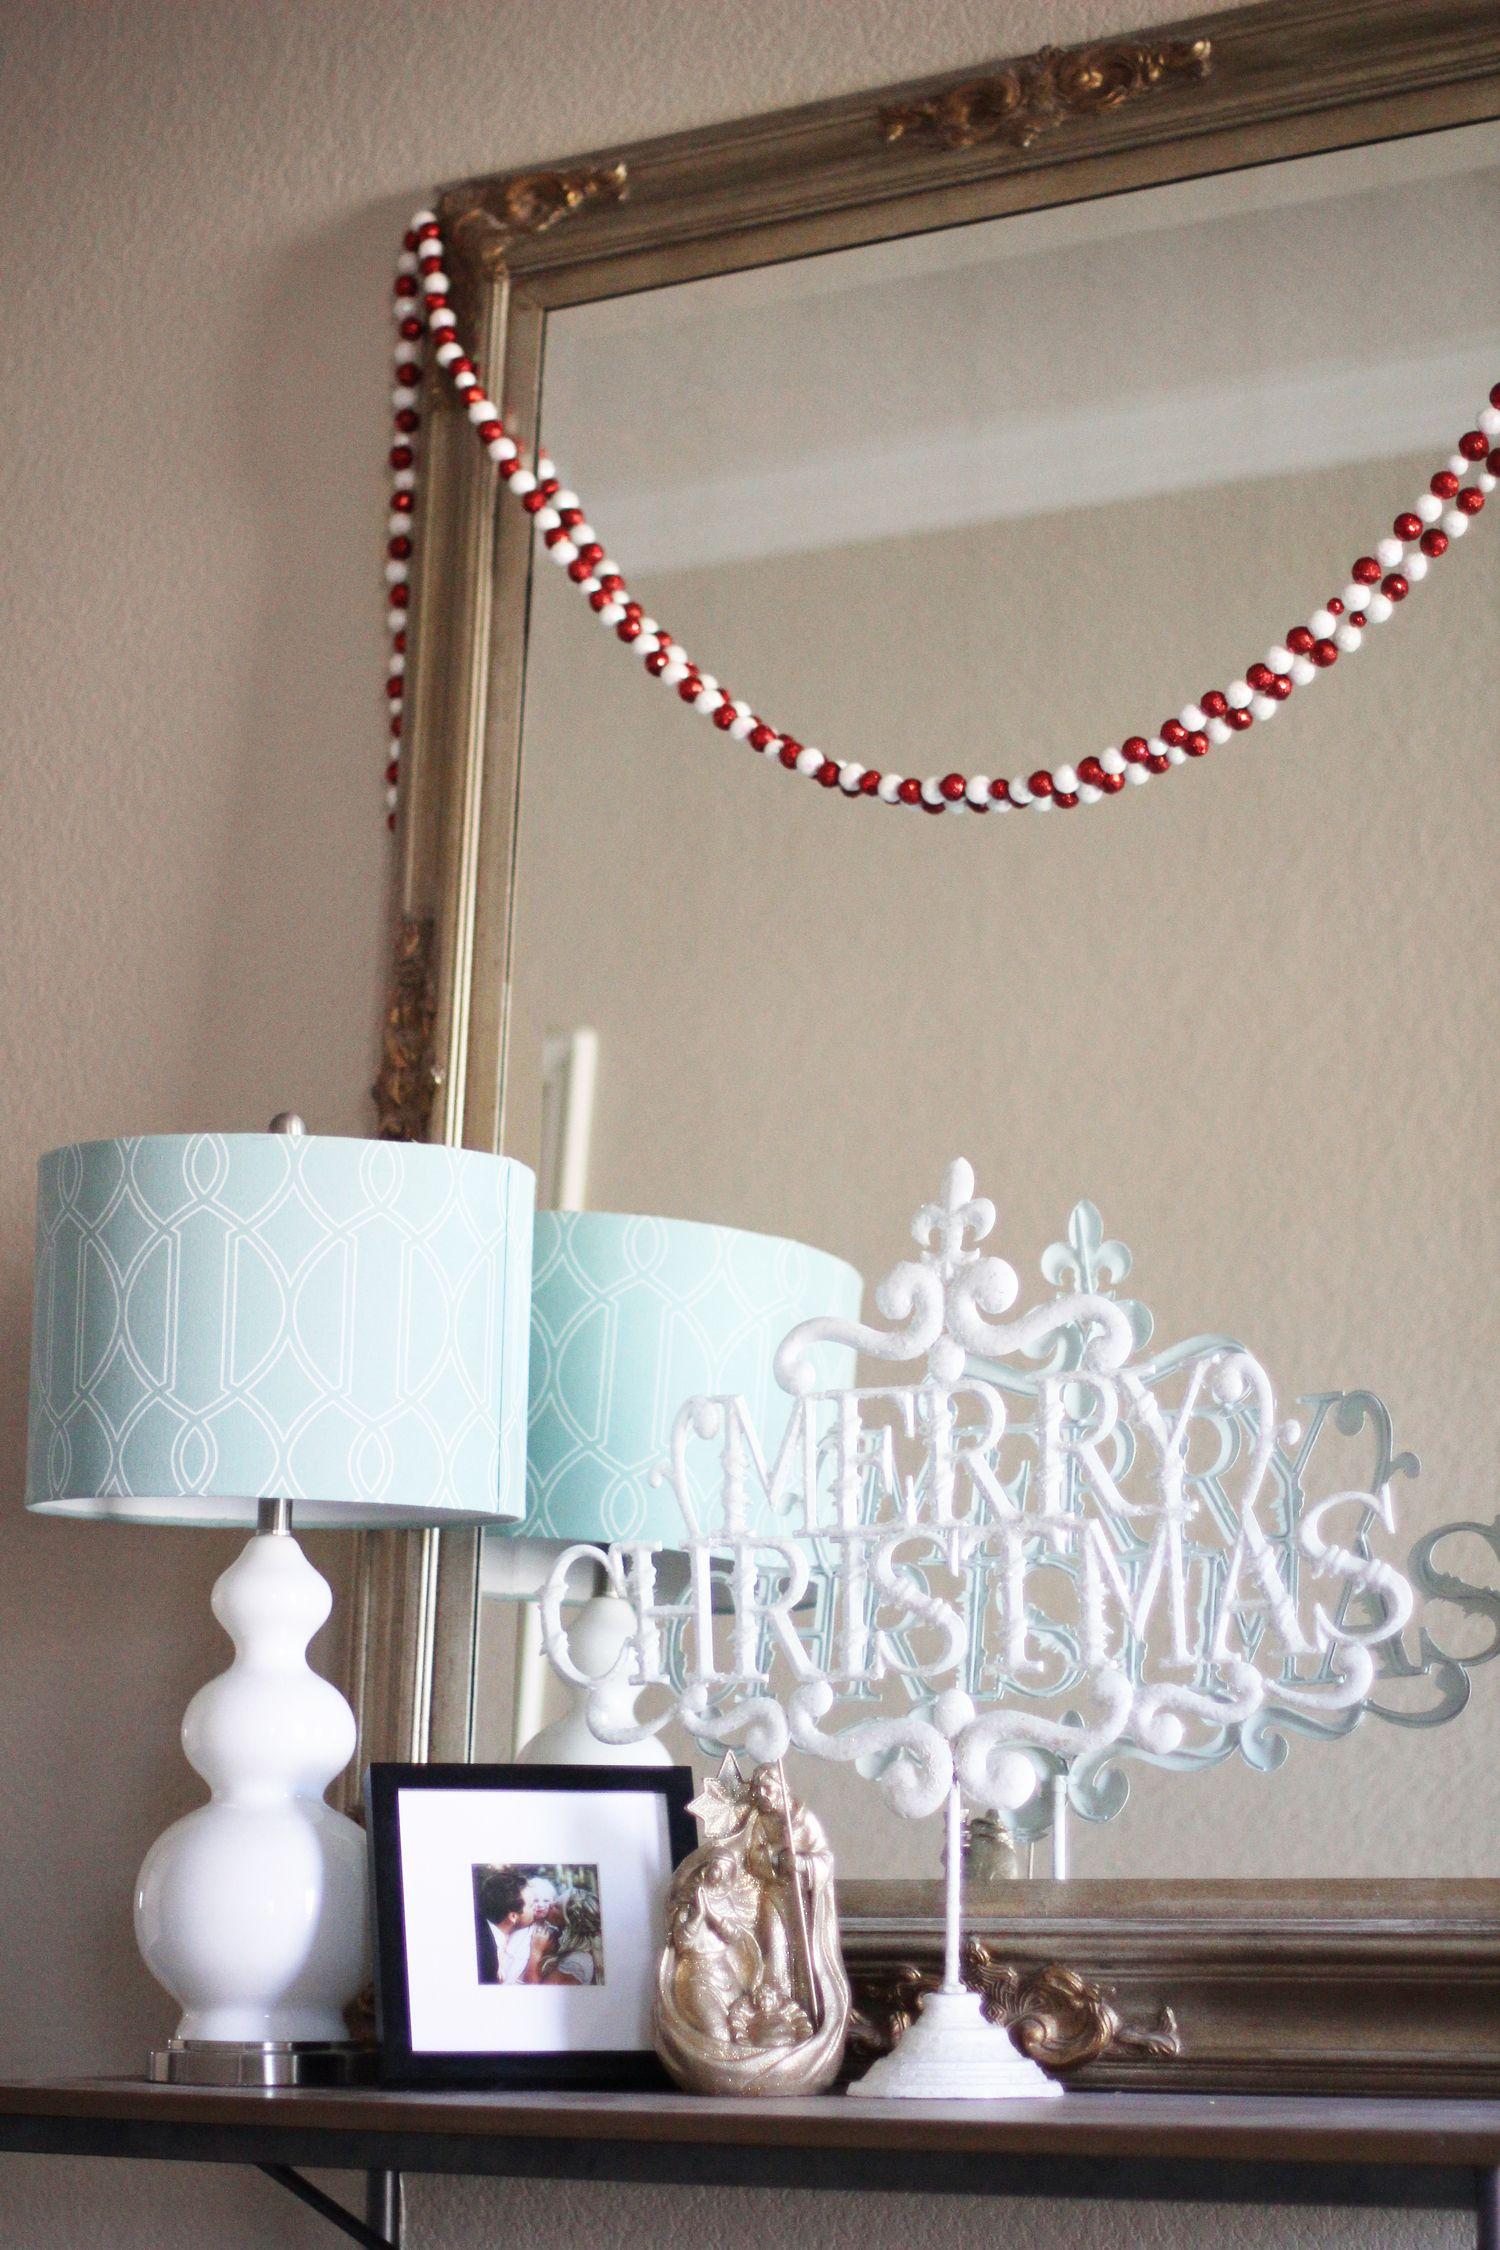 my home for the holidays | Holidays, Holiday time and Christmas lights